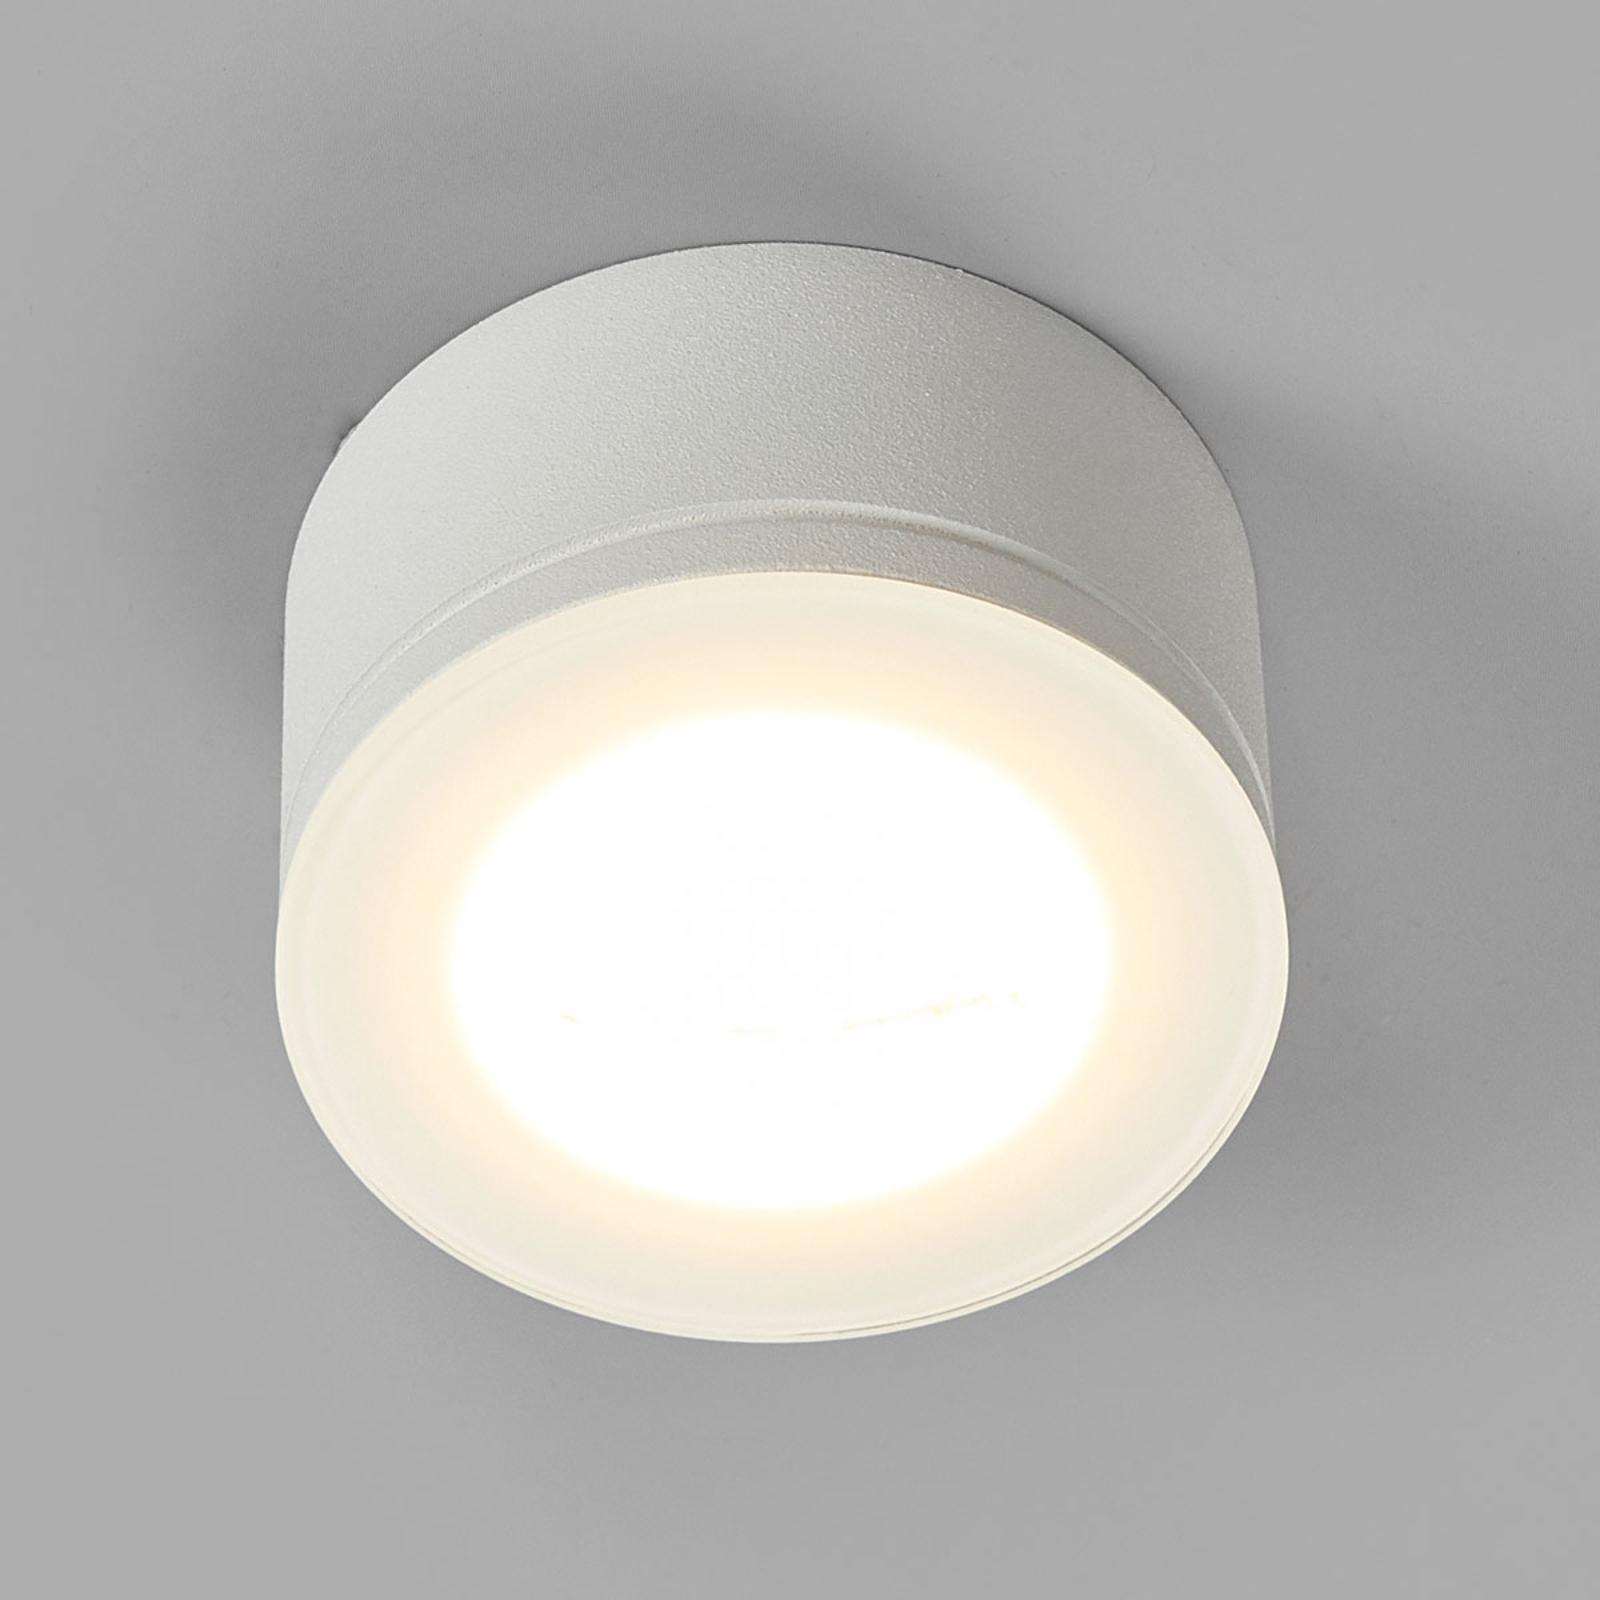 Pre int. a ext. bodové LED svietidlo Newton 35_3023104_1